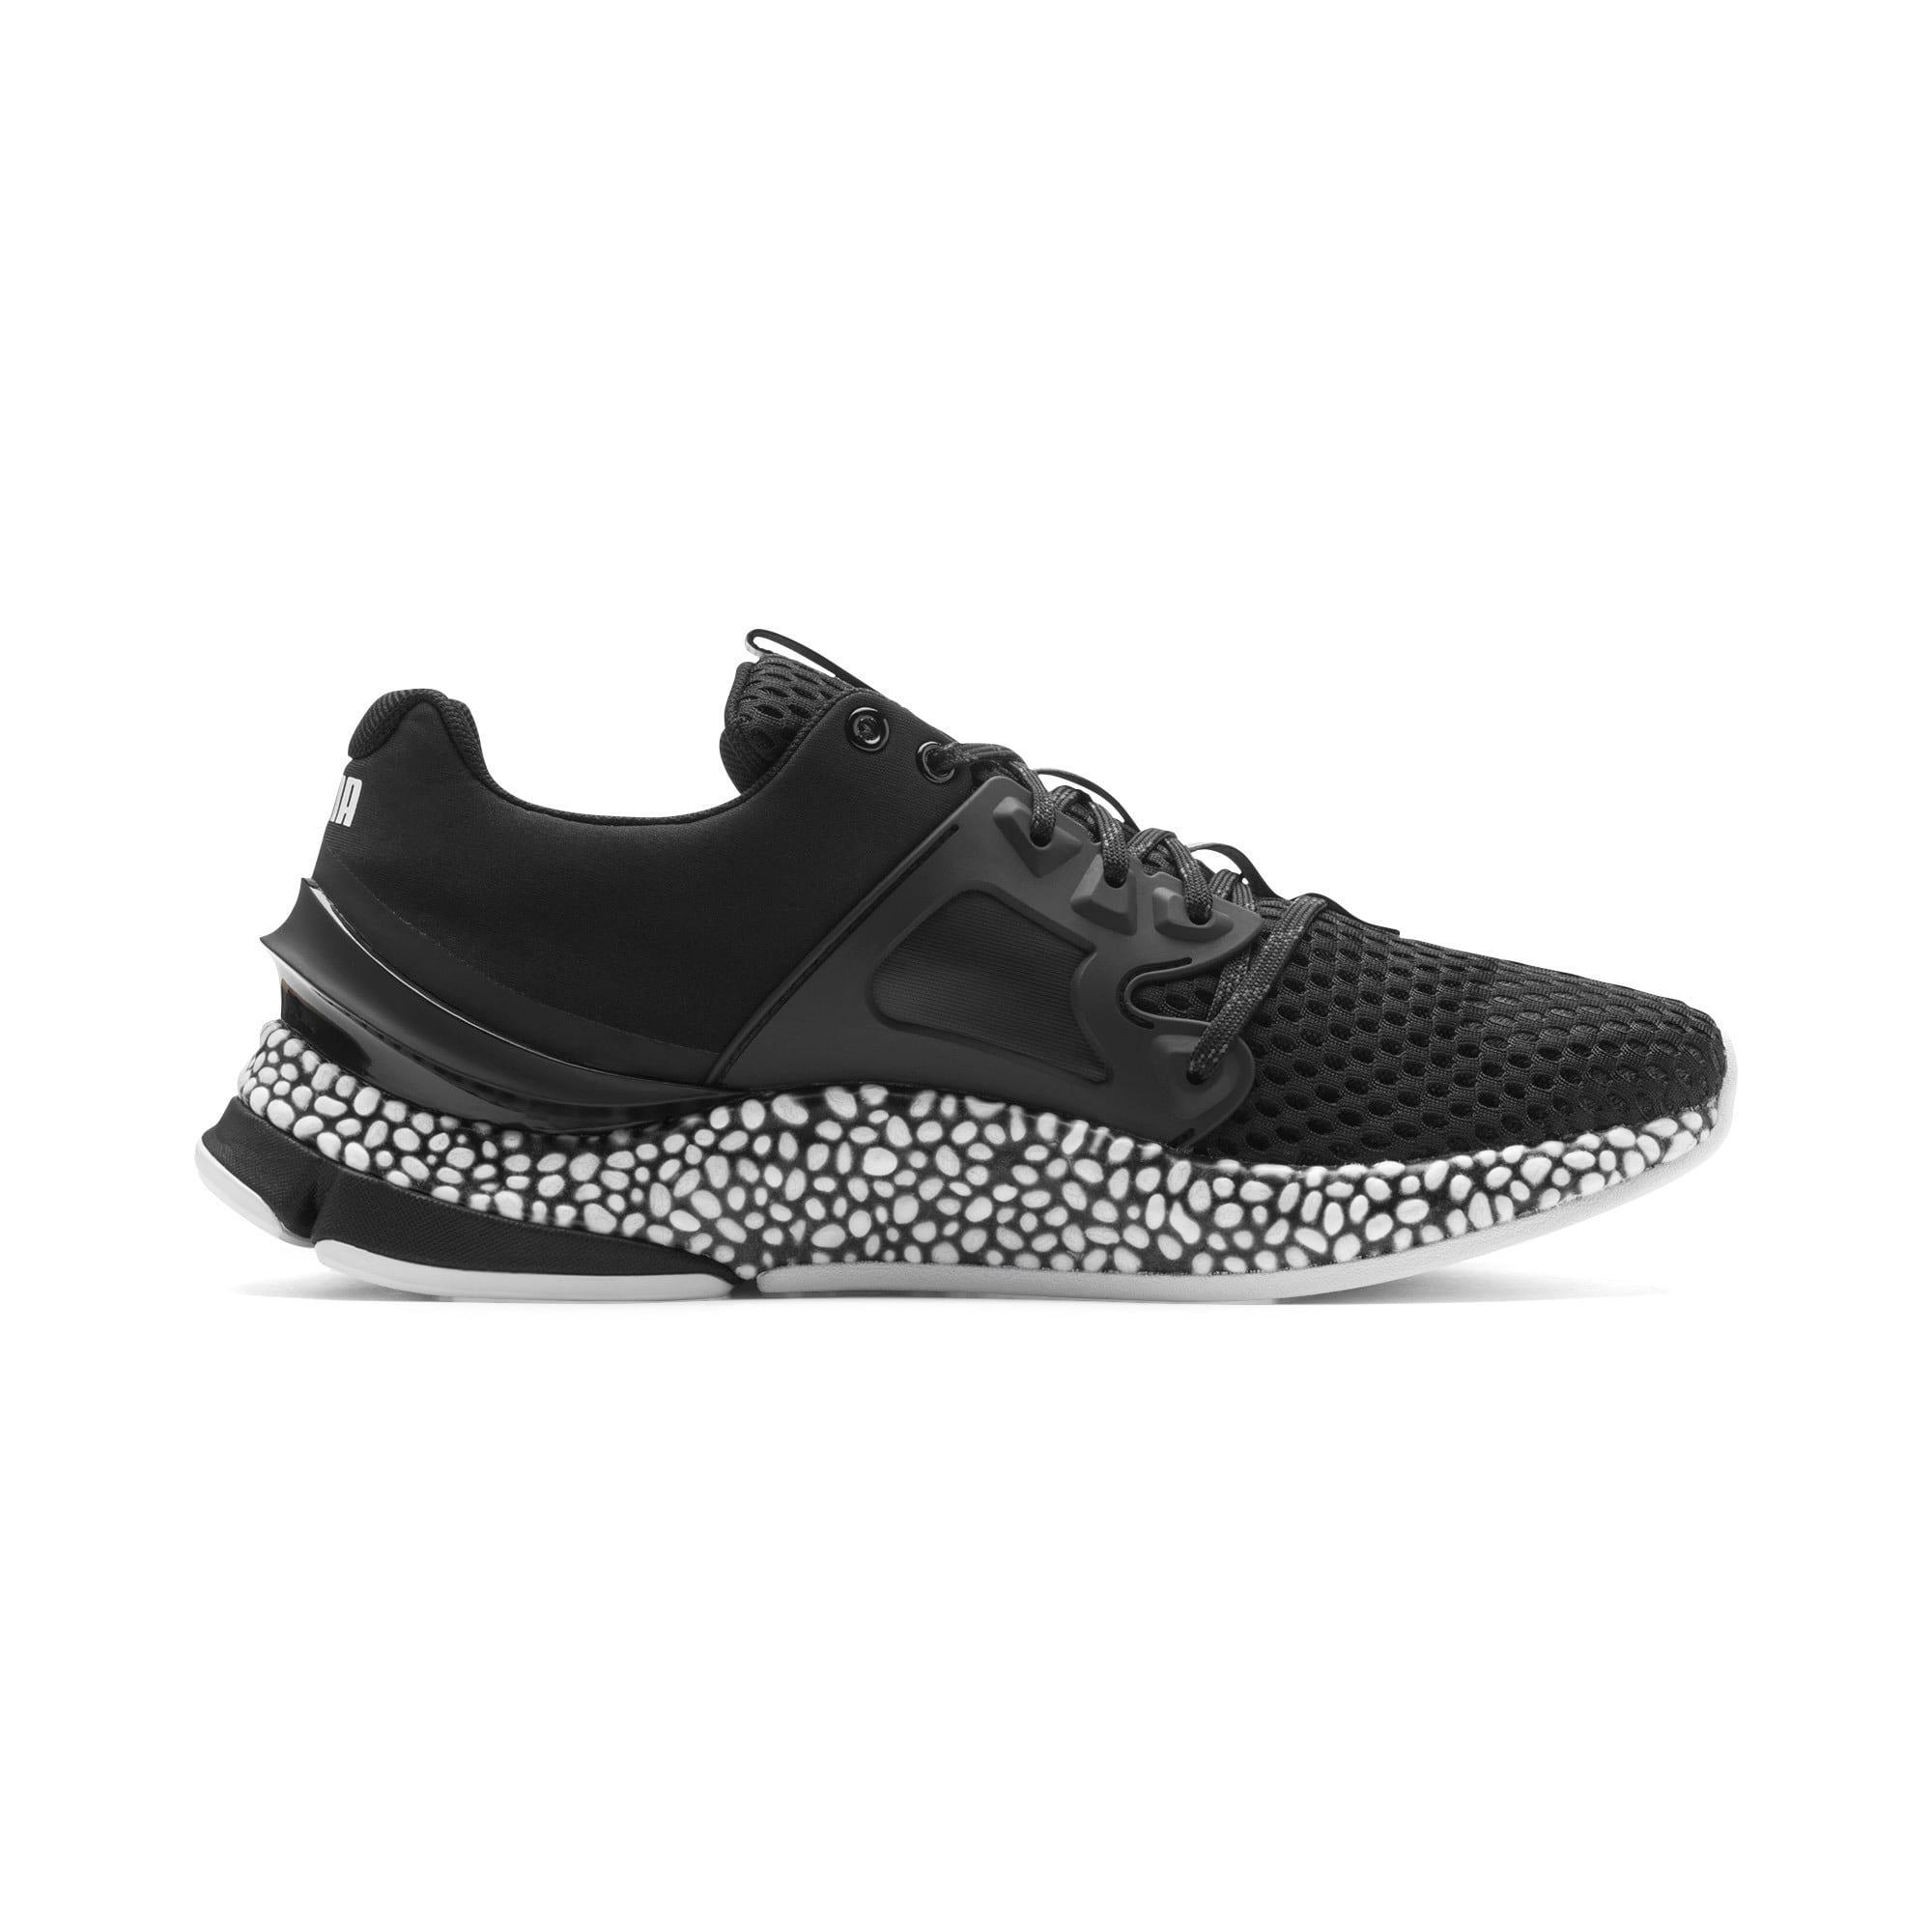 Thumbnail 6 of HYBRID Sky Men's Running Shoes, Puma Black-Puma White, medium